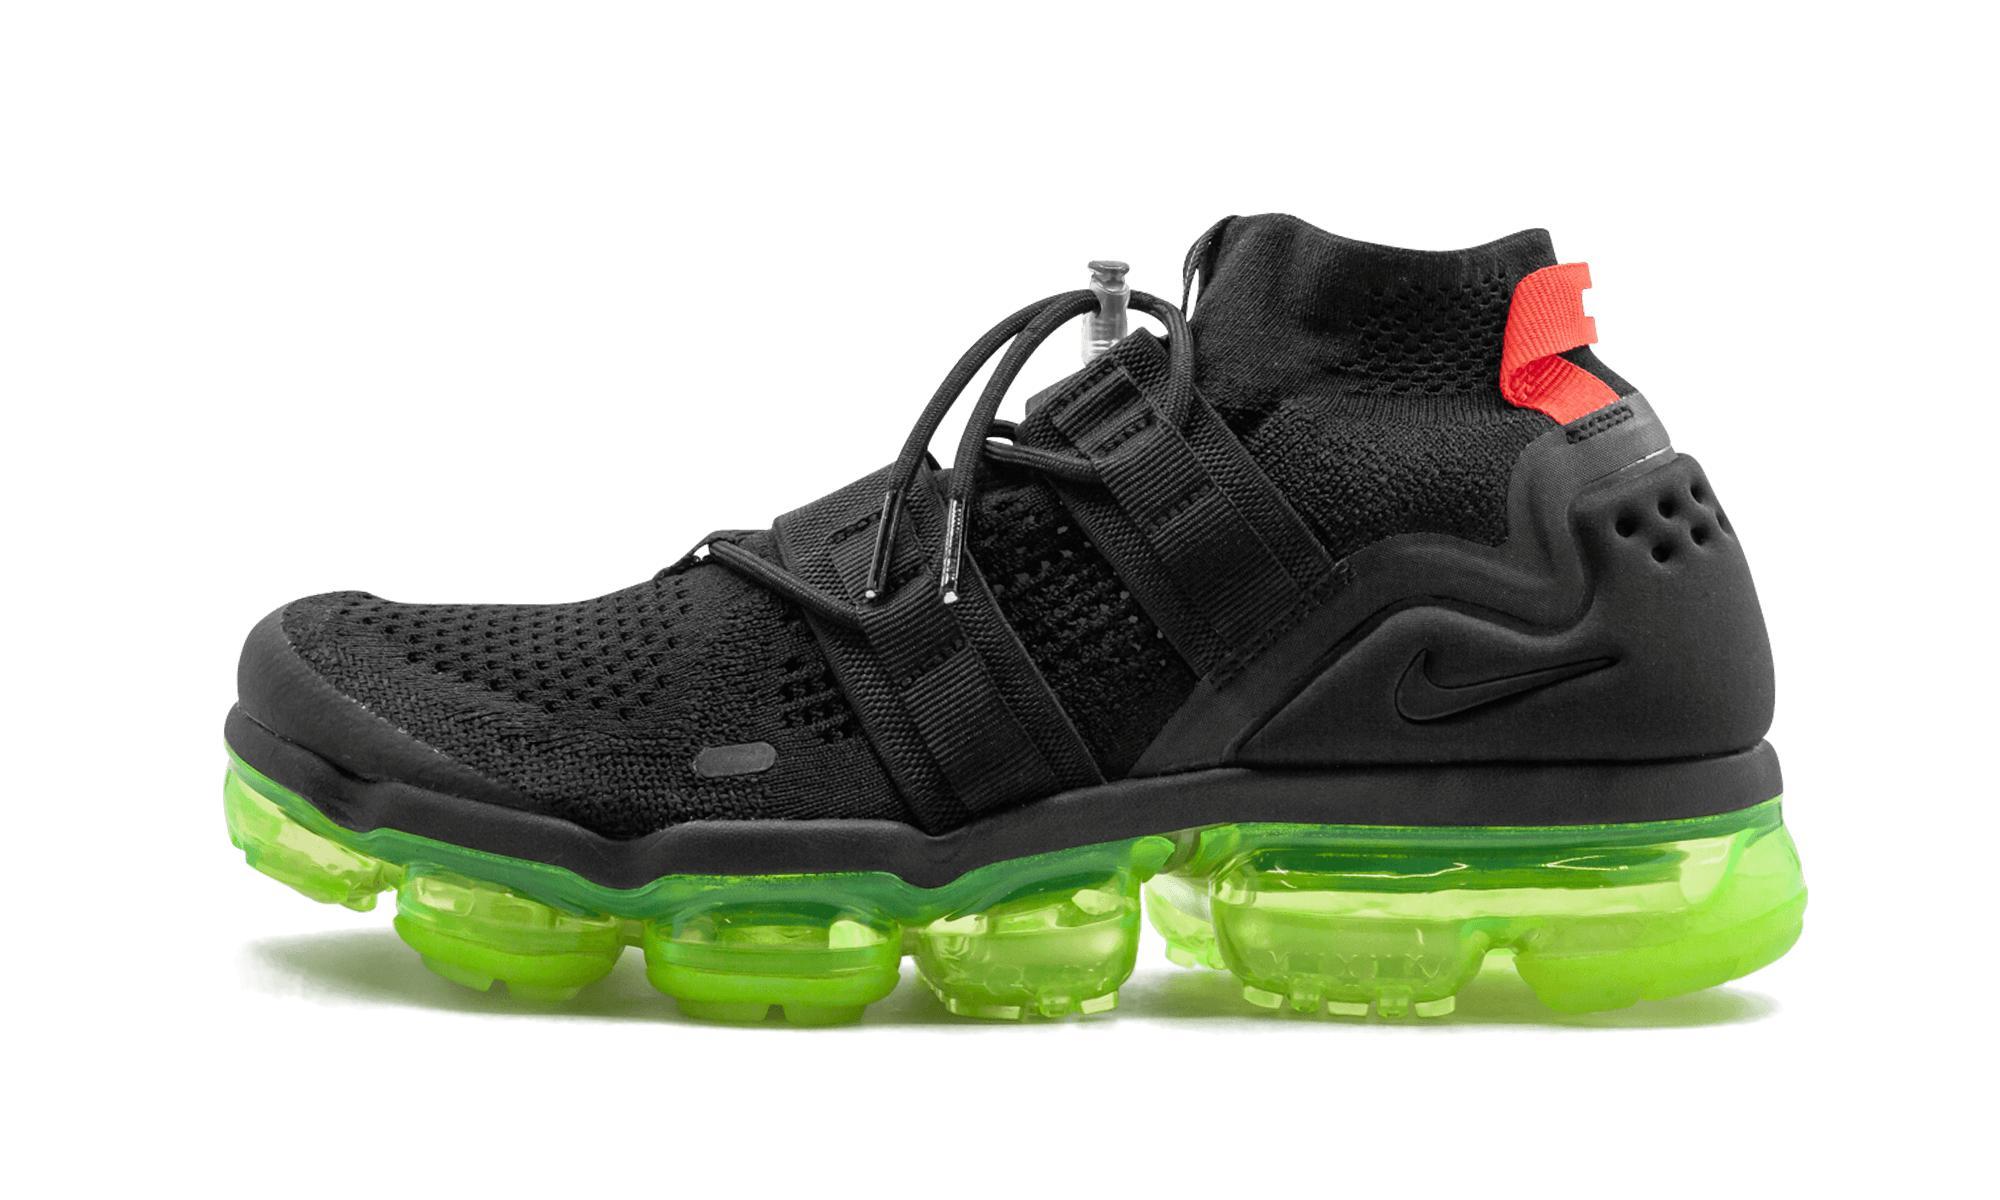 9c04d5e35859b Nike Air Vapormax Fk Utility in Black - Lyst